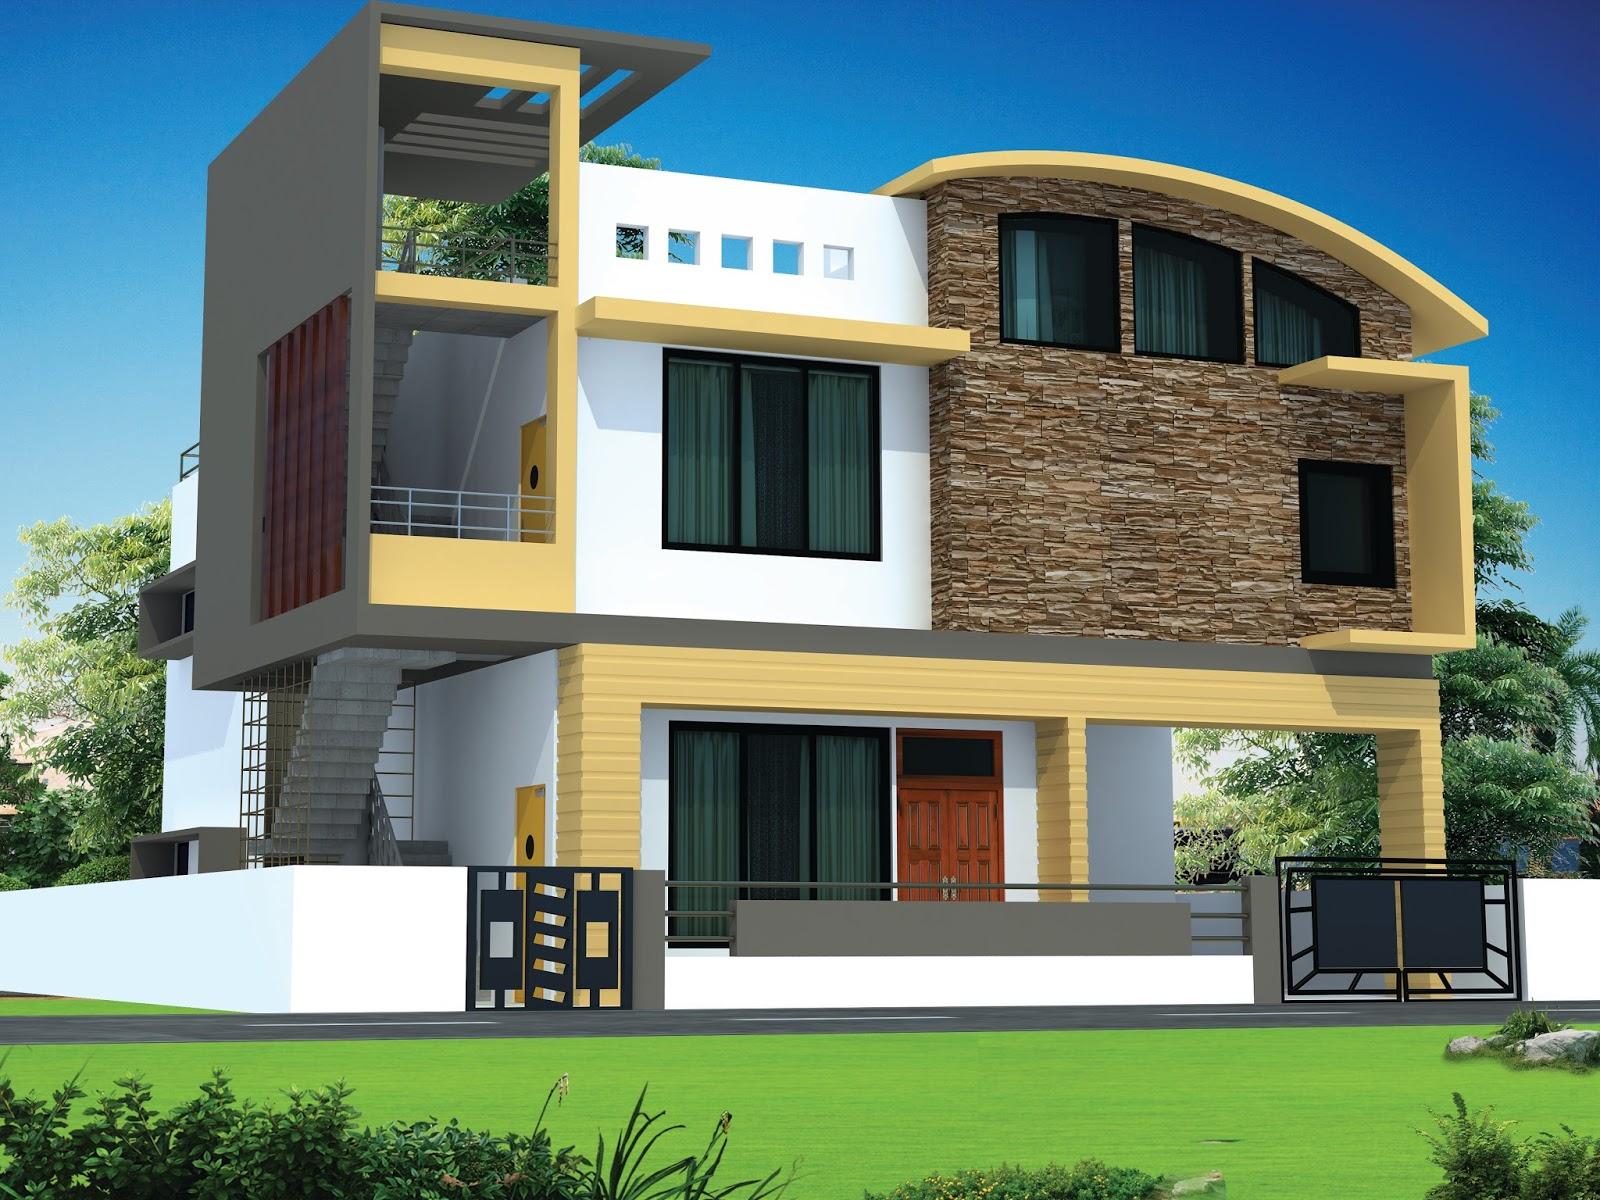 Modern house design modern house designs new architecture unique india bunglaw building facade view 3d exterior home concept